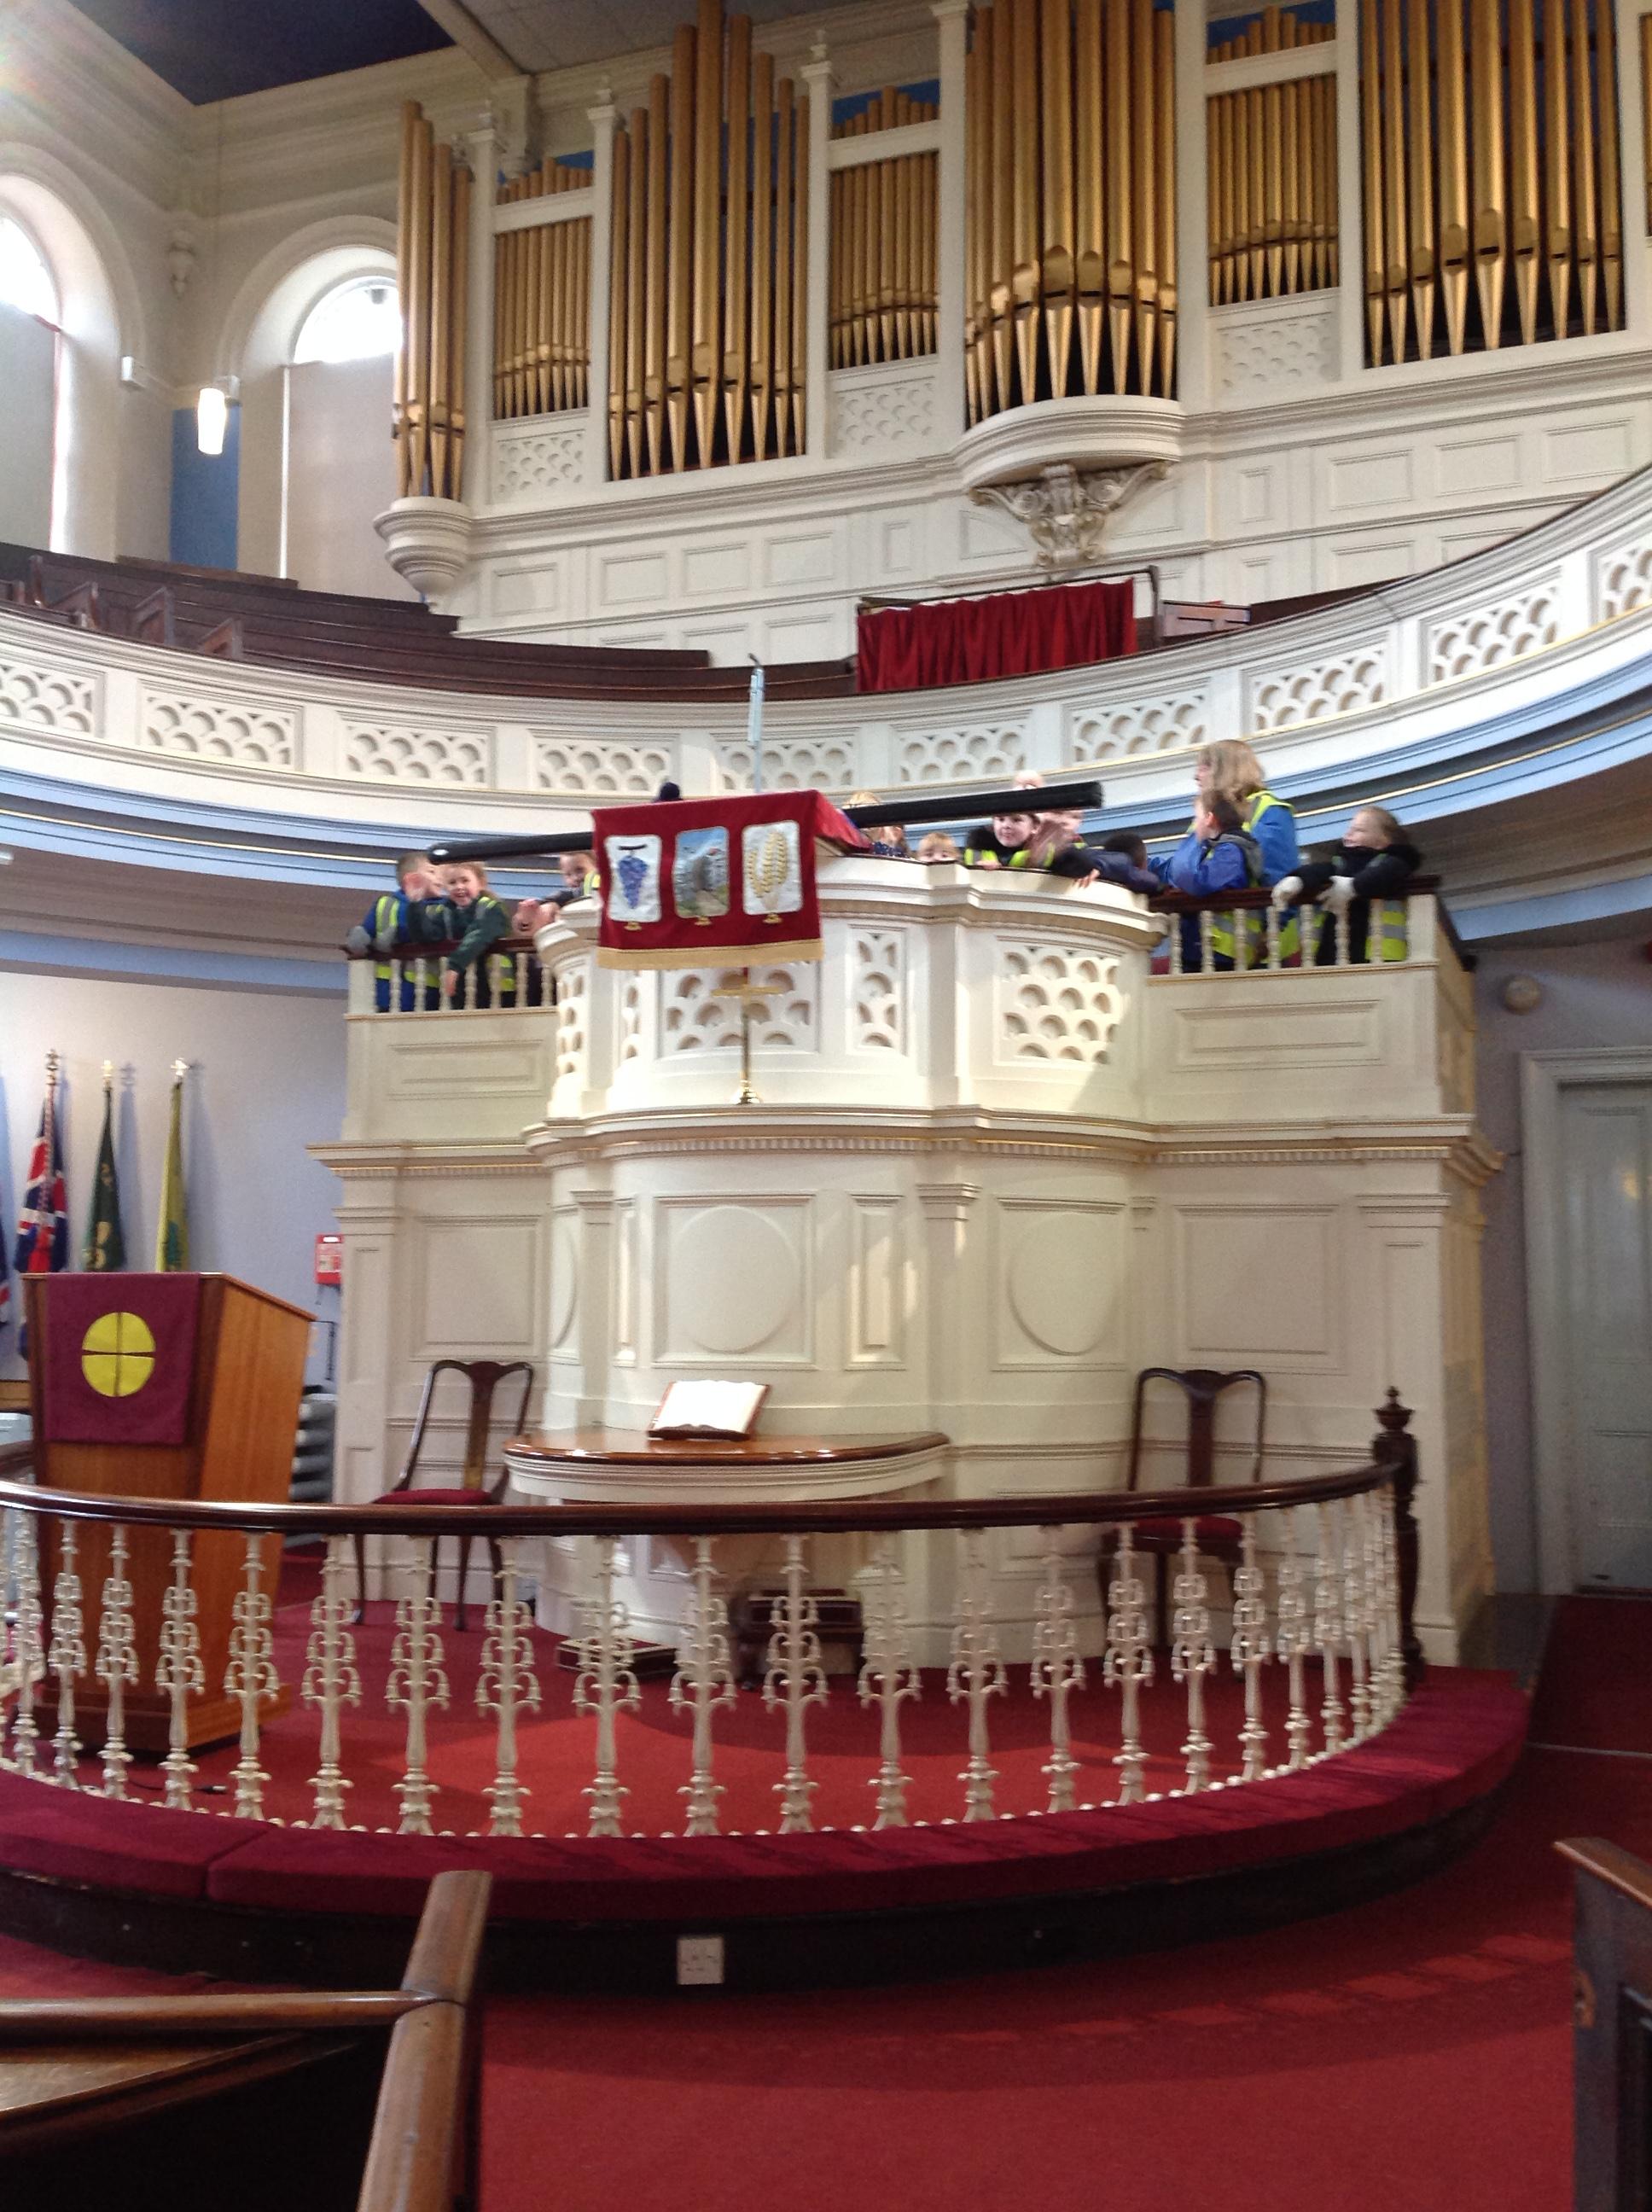 We explored the Methodist Church.